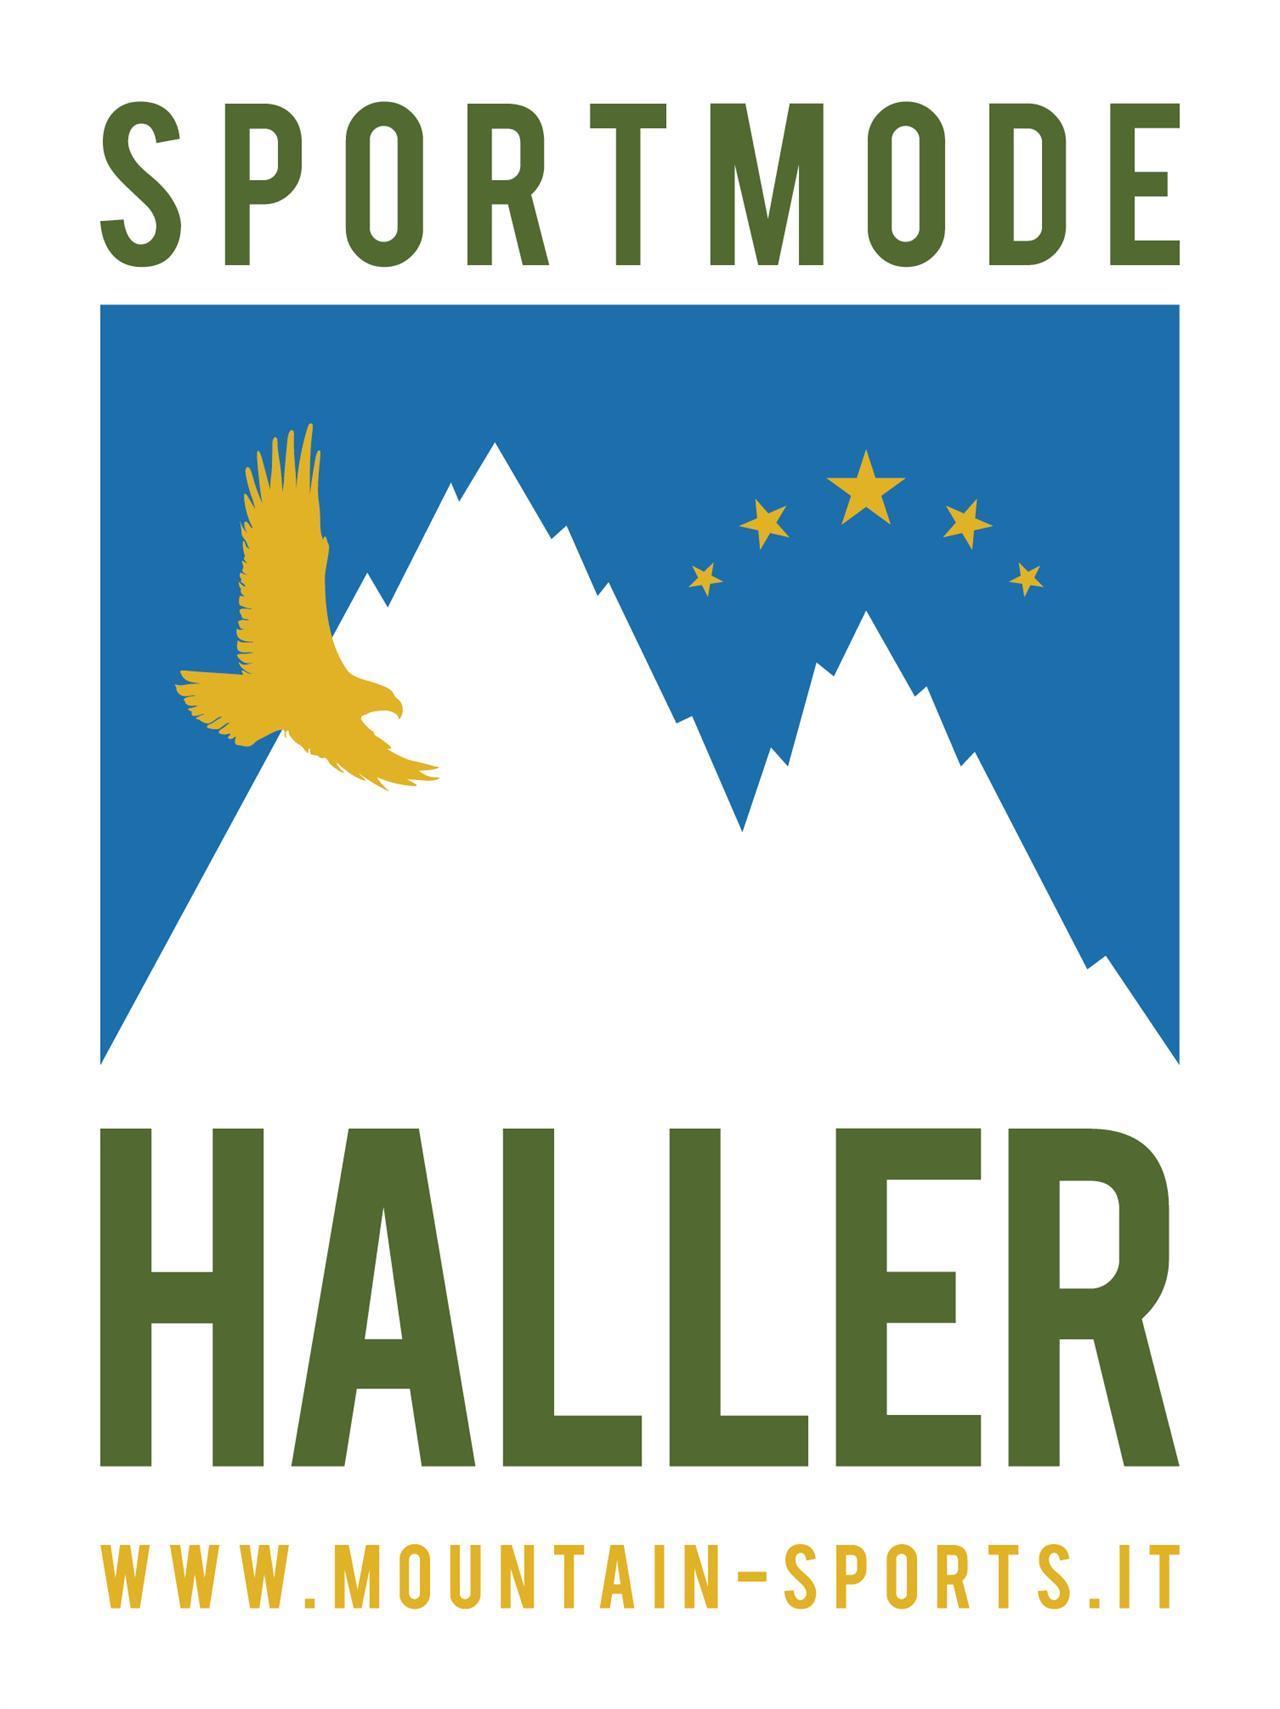 Sportmode Haller